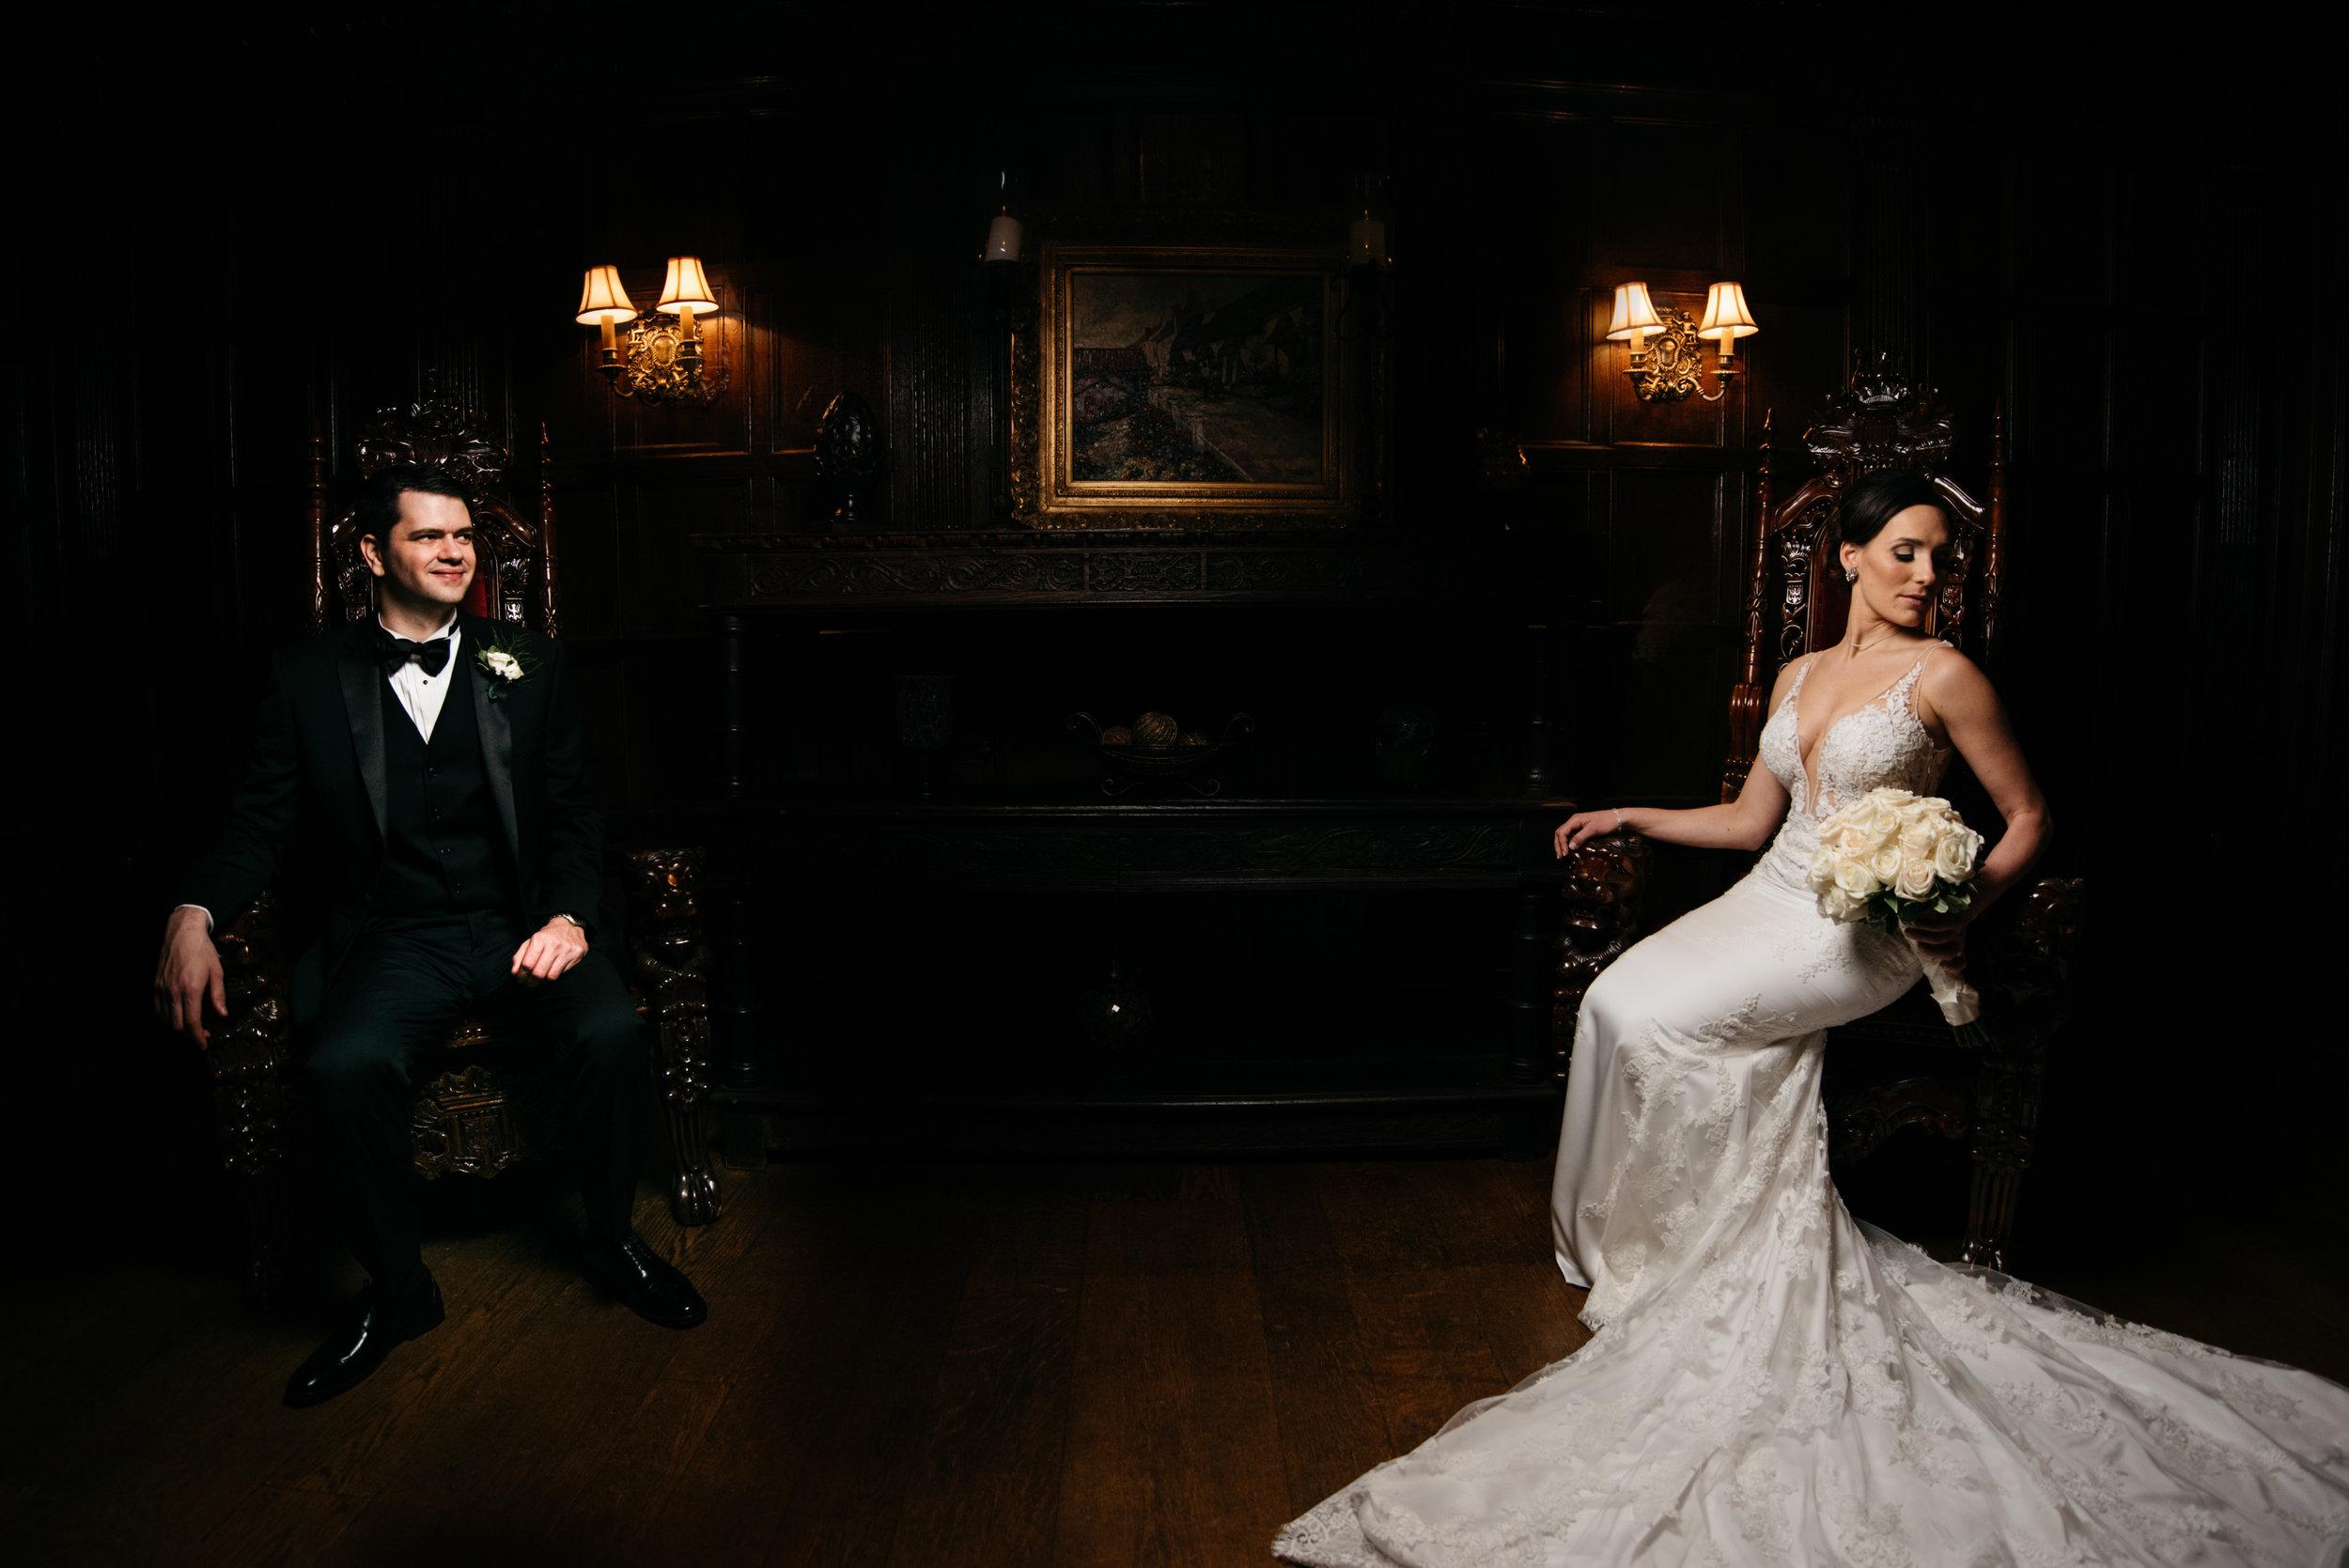 WeddingPhotos | NJPhotographer | Highlights-1-18.jpg